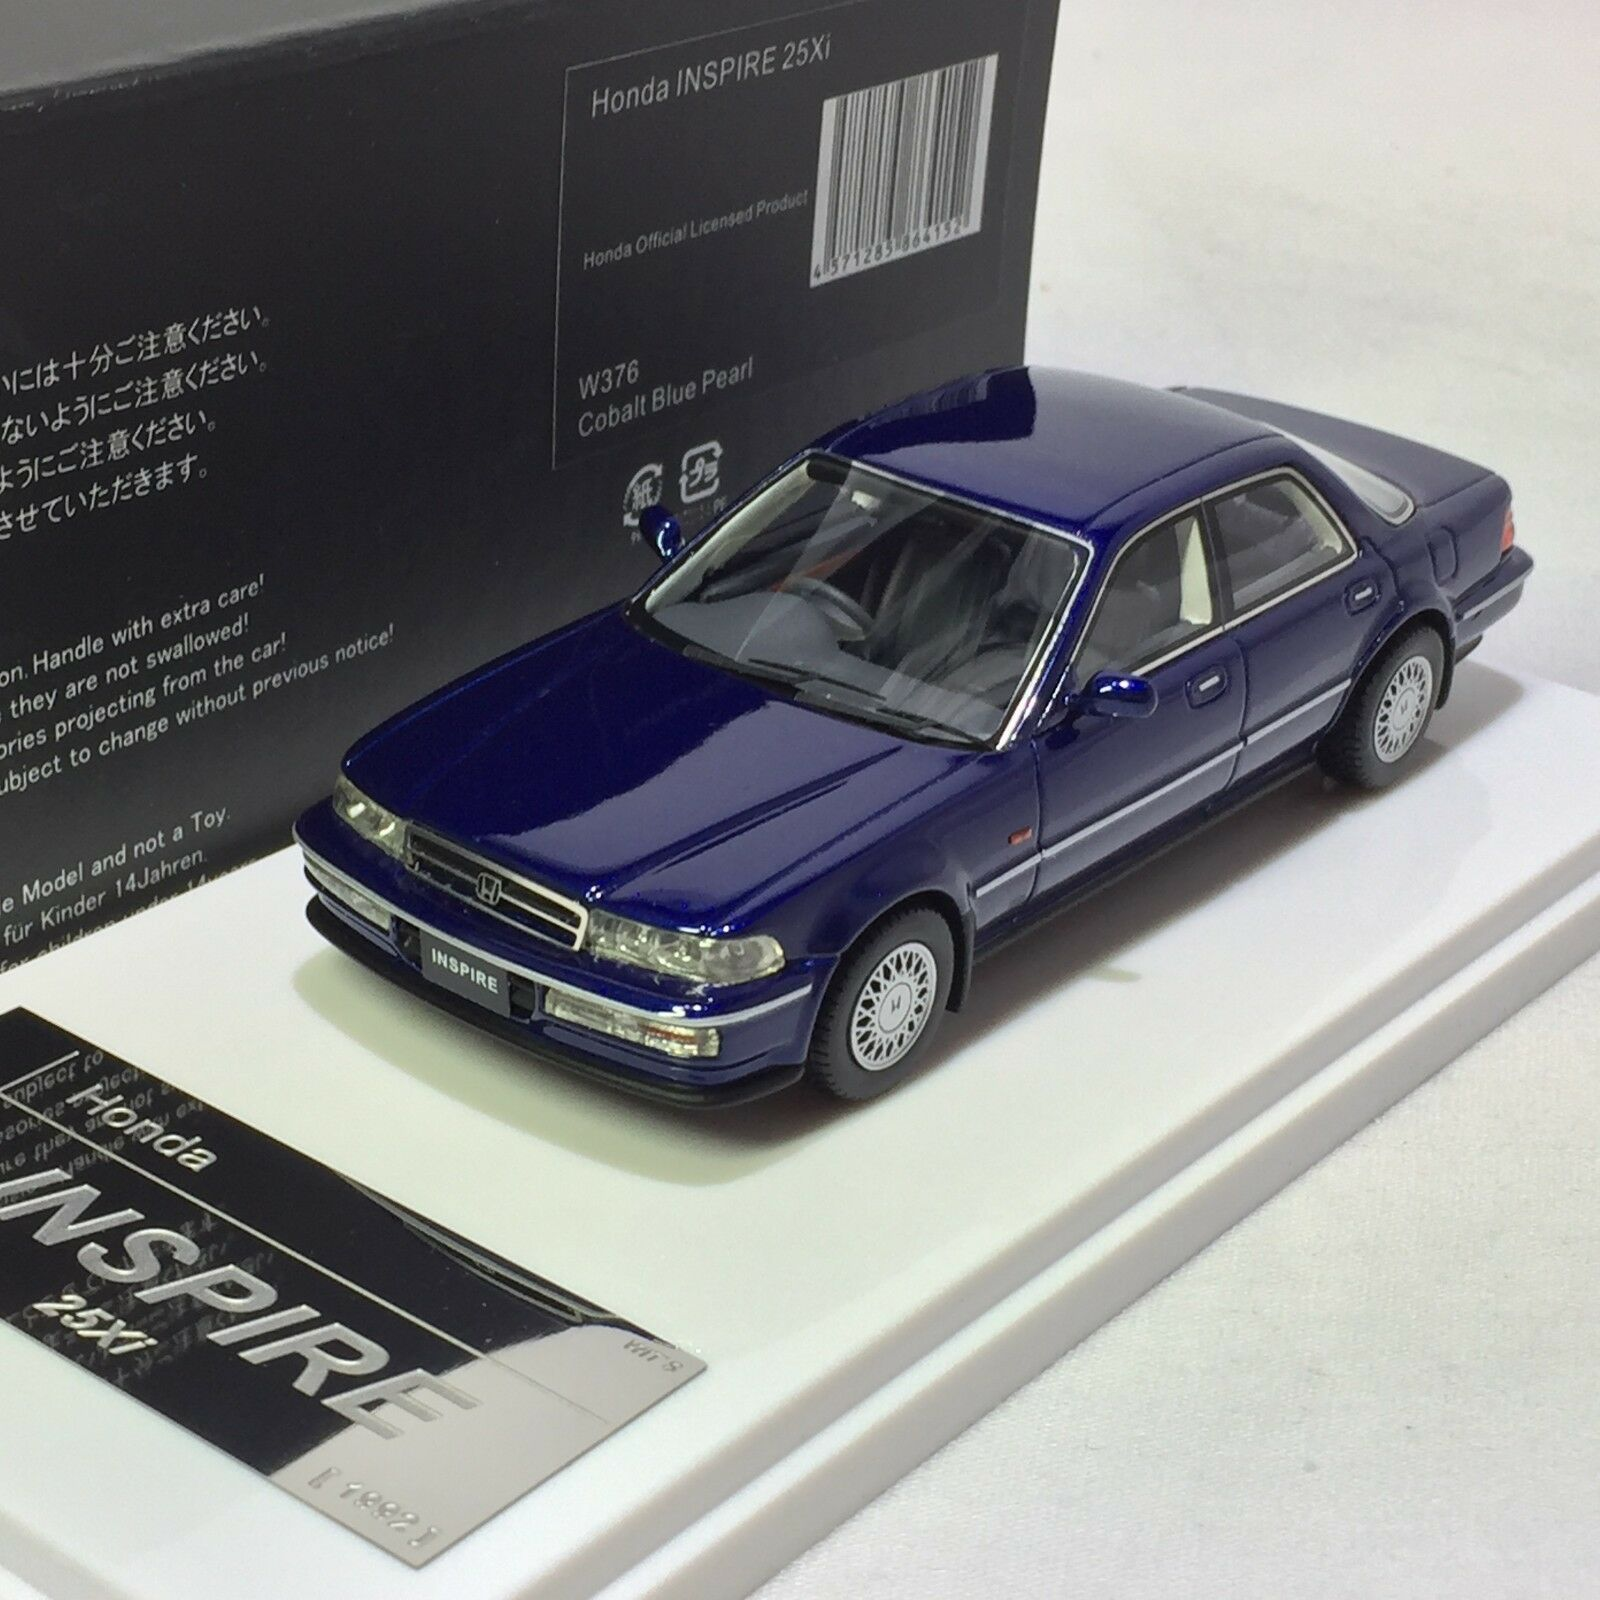 nuovo sadico 1 43 WIT'S Honda INSPIRE 25Xi Cobalt Cobalt Cobalt blu Pearl  W376  più sconto